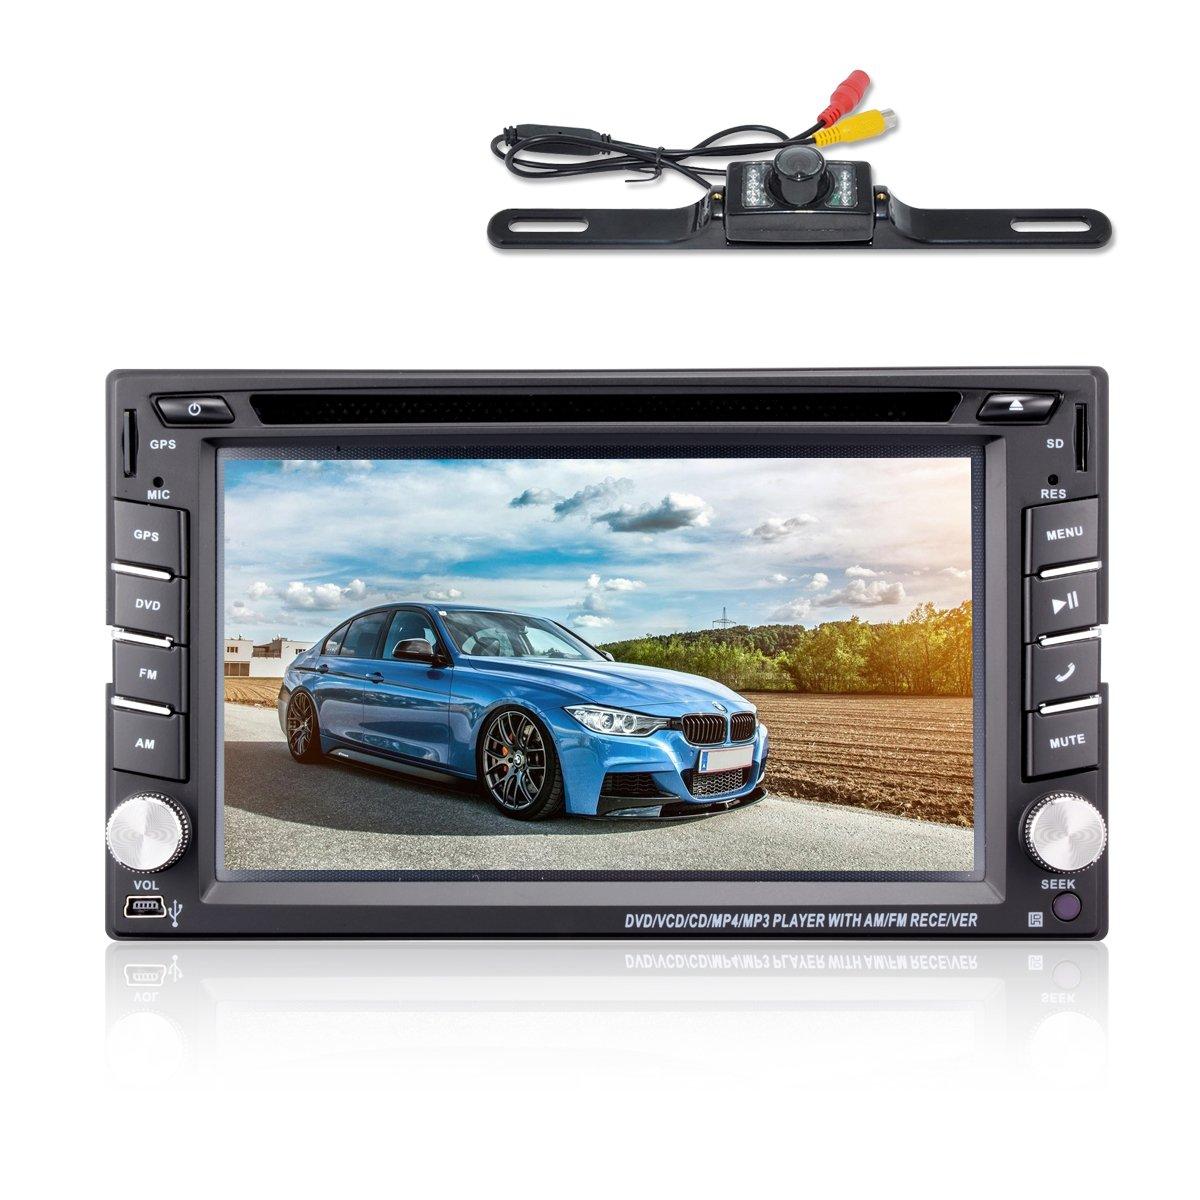 "Amazon.com: 6.2"" Double DIN Car Stereo Car GPS Navigation - Ehotchpotch Car  Radio Head Units Touch Screen Car DVD Player in-Dash Car Audio AM/FM Radio  ..."